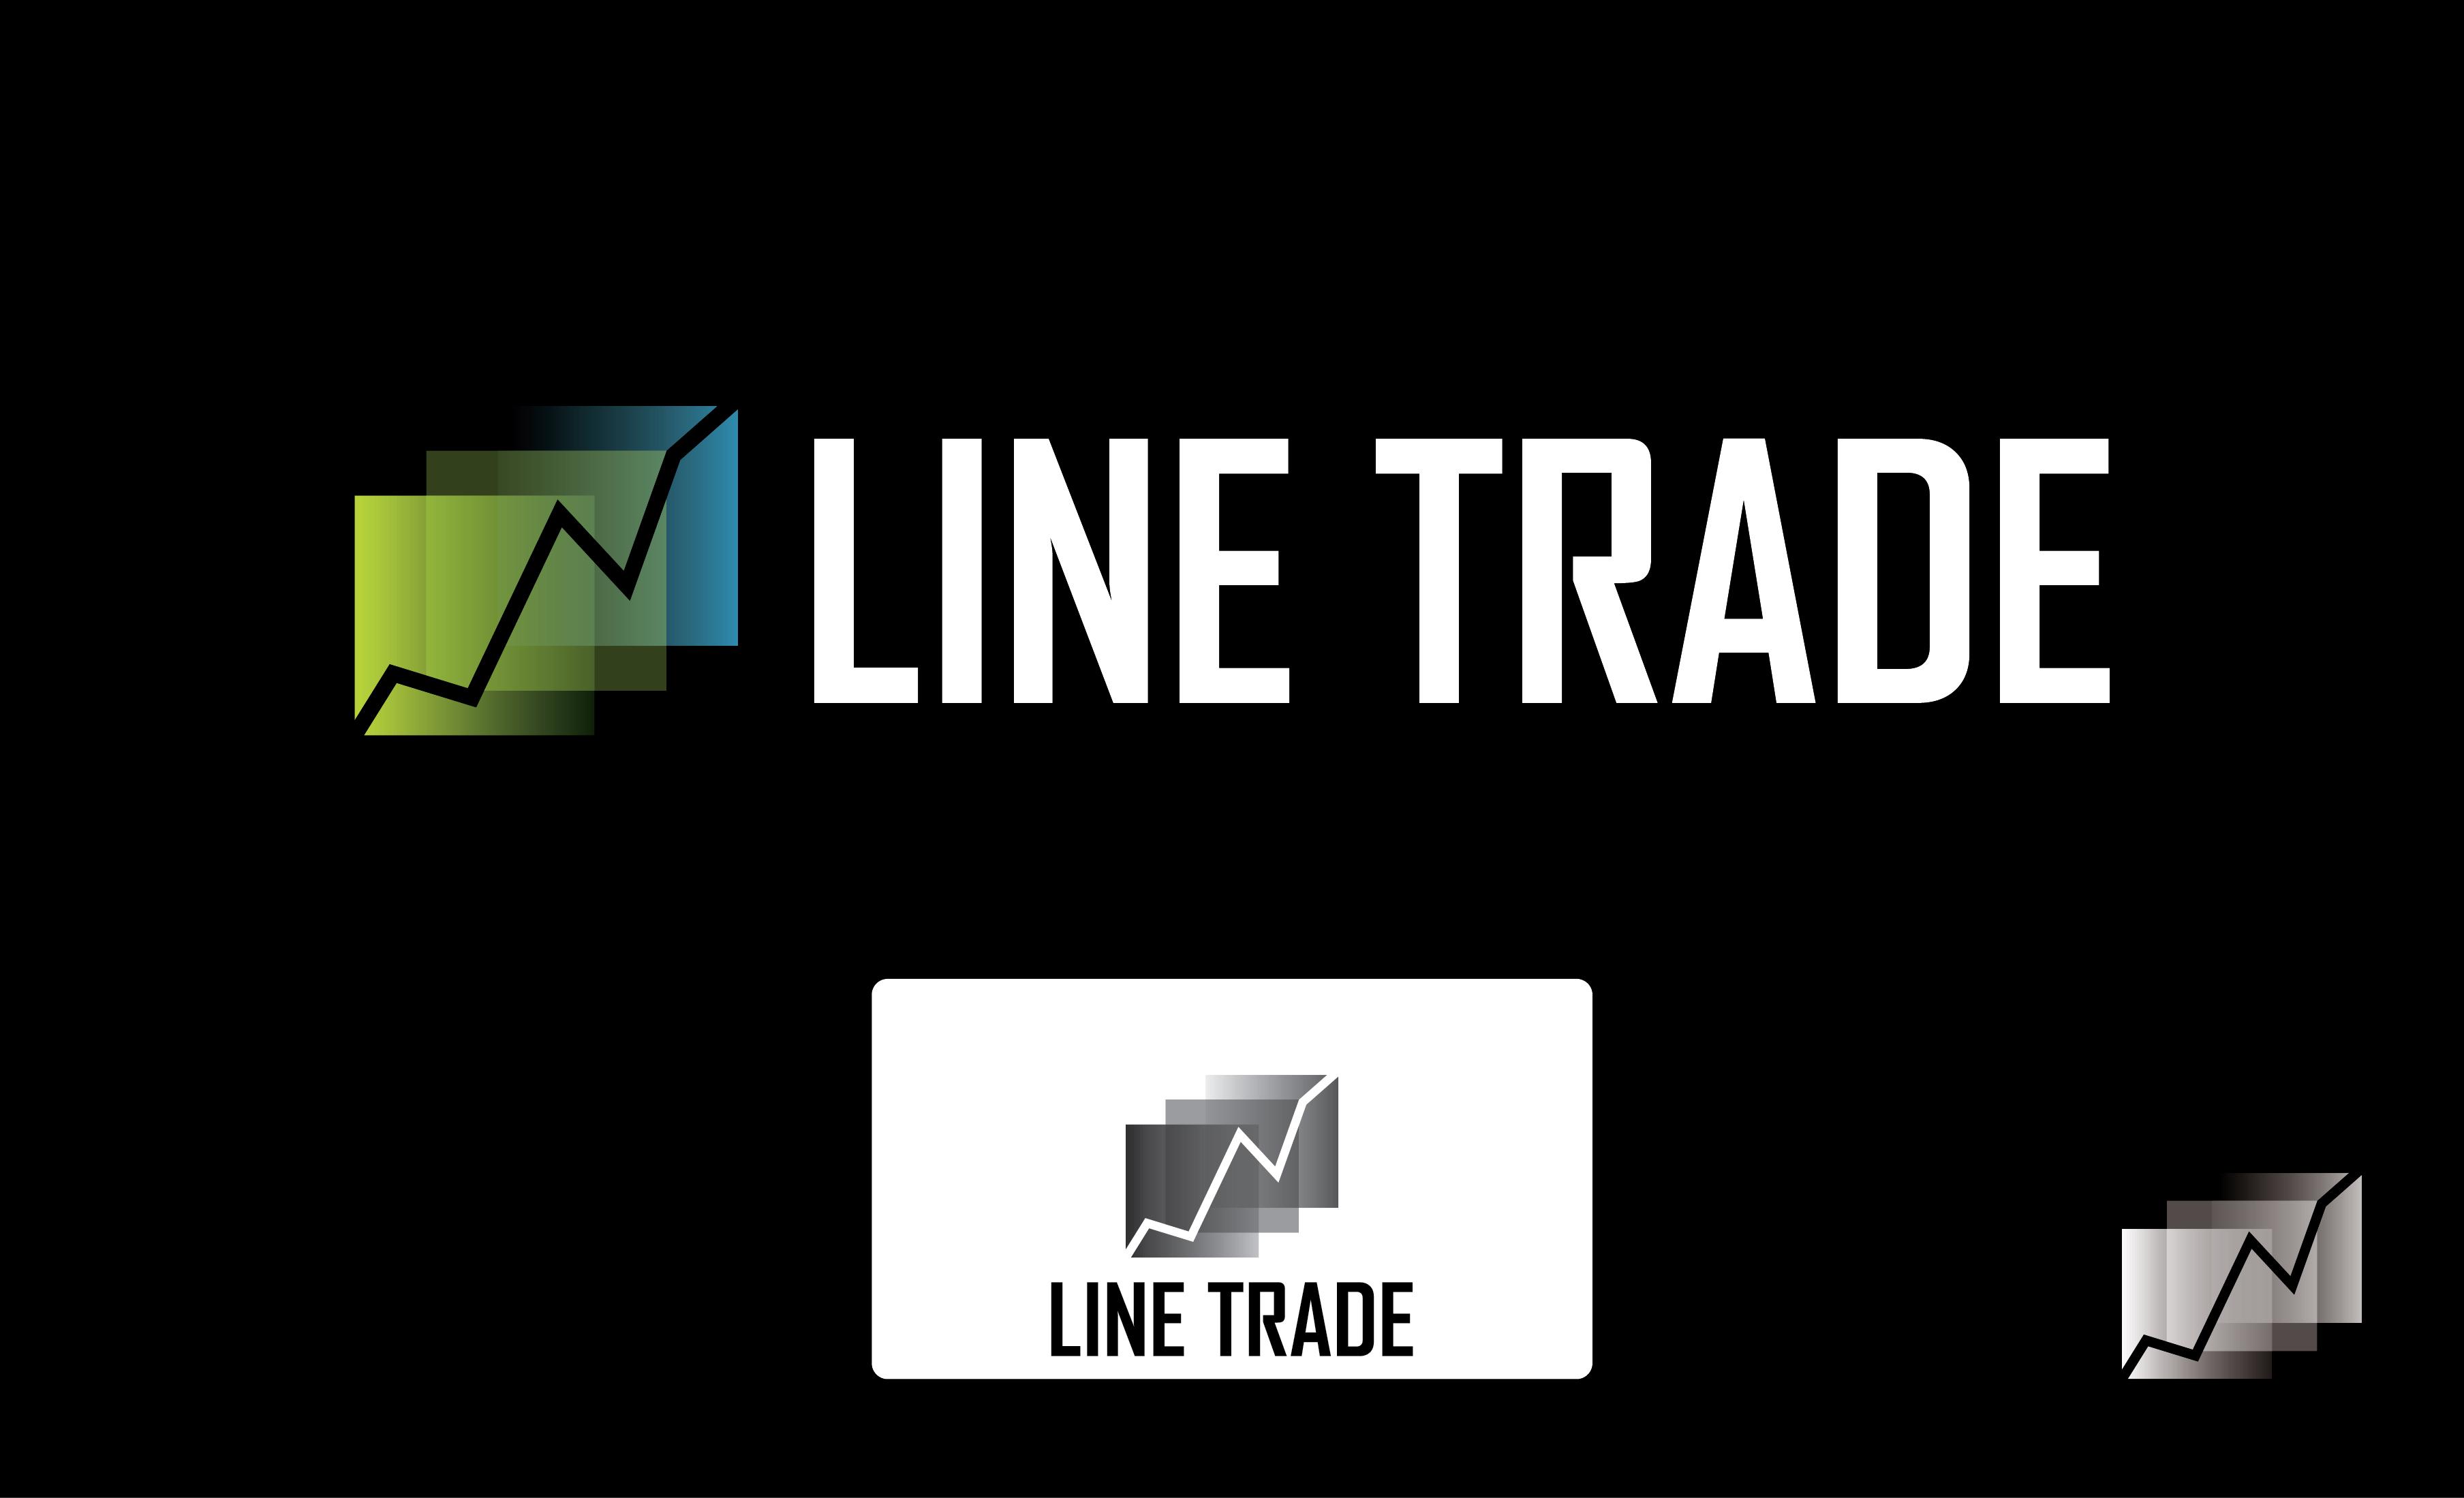 Разработка логотипа компании Line Trade фото f_13550fd5ae14ab1a.jpg